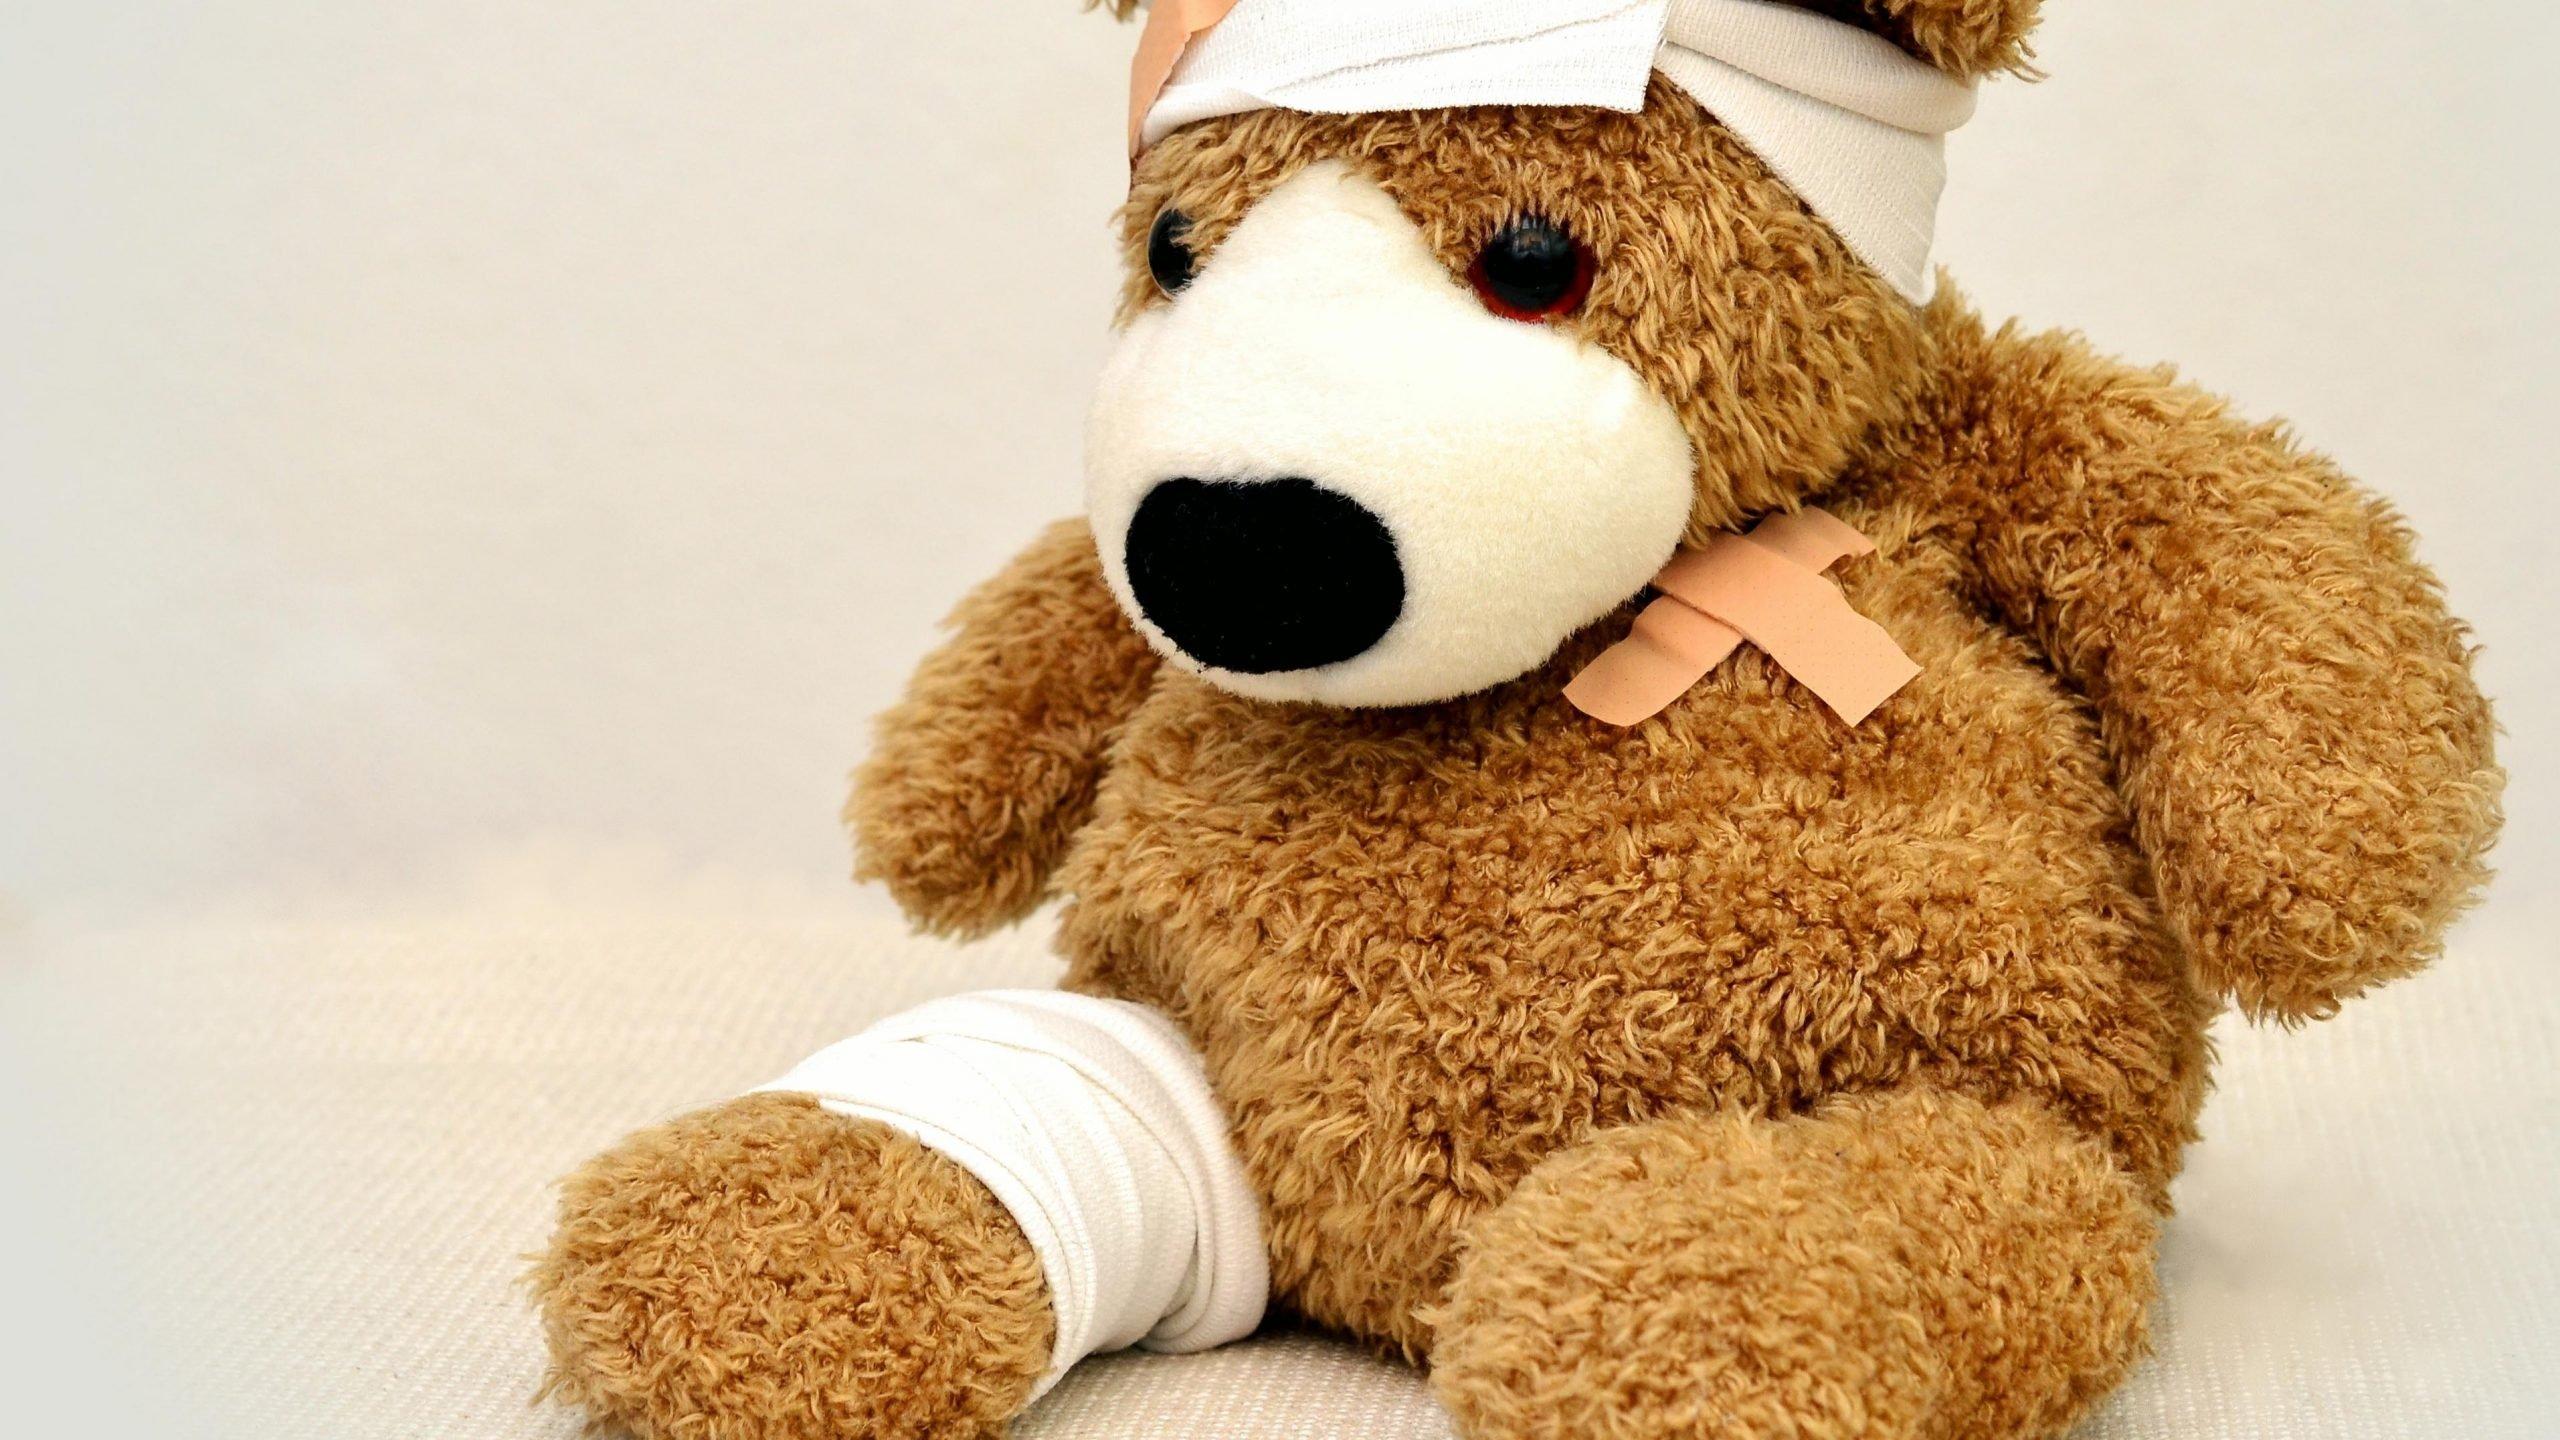 teddy bear full of bandage sitting in a corner room